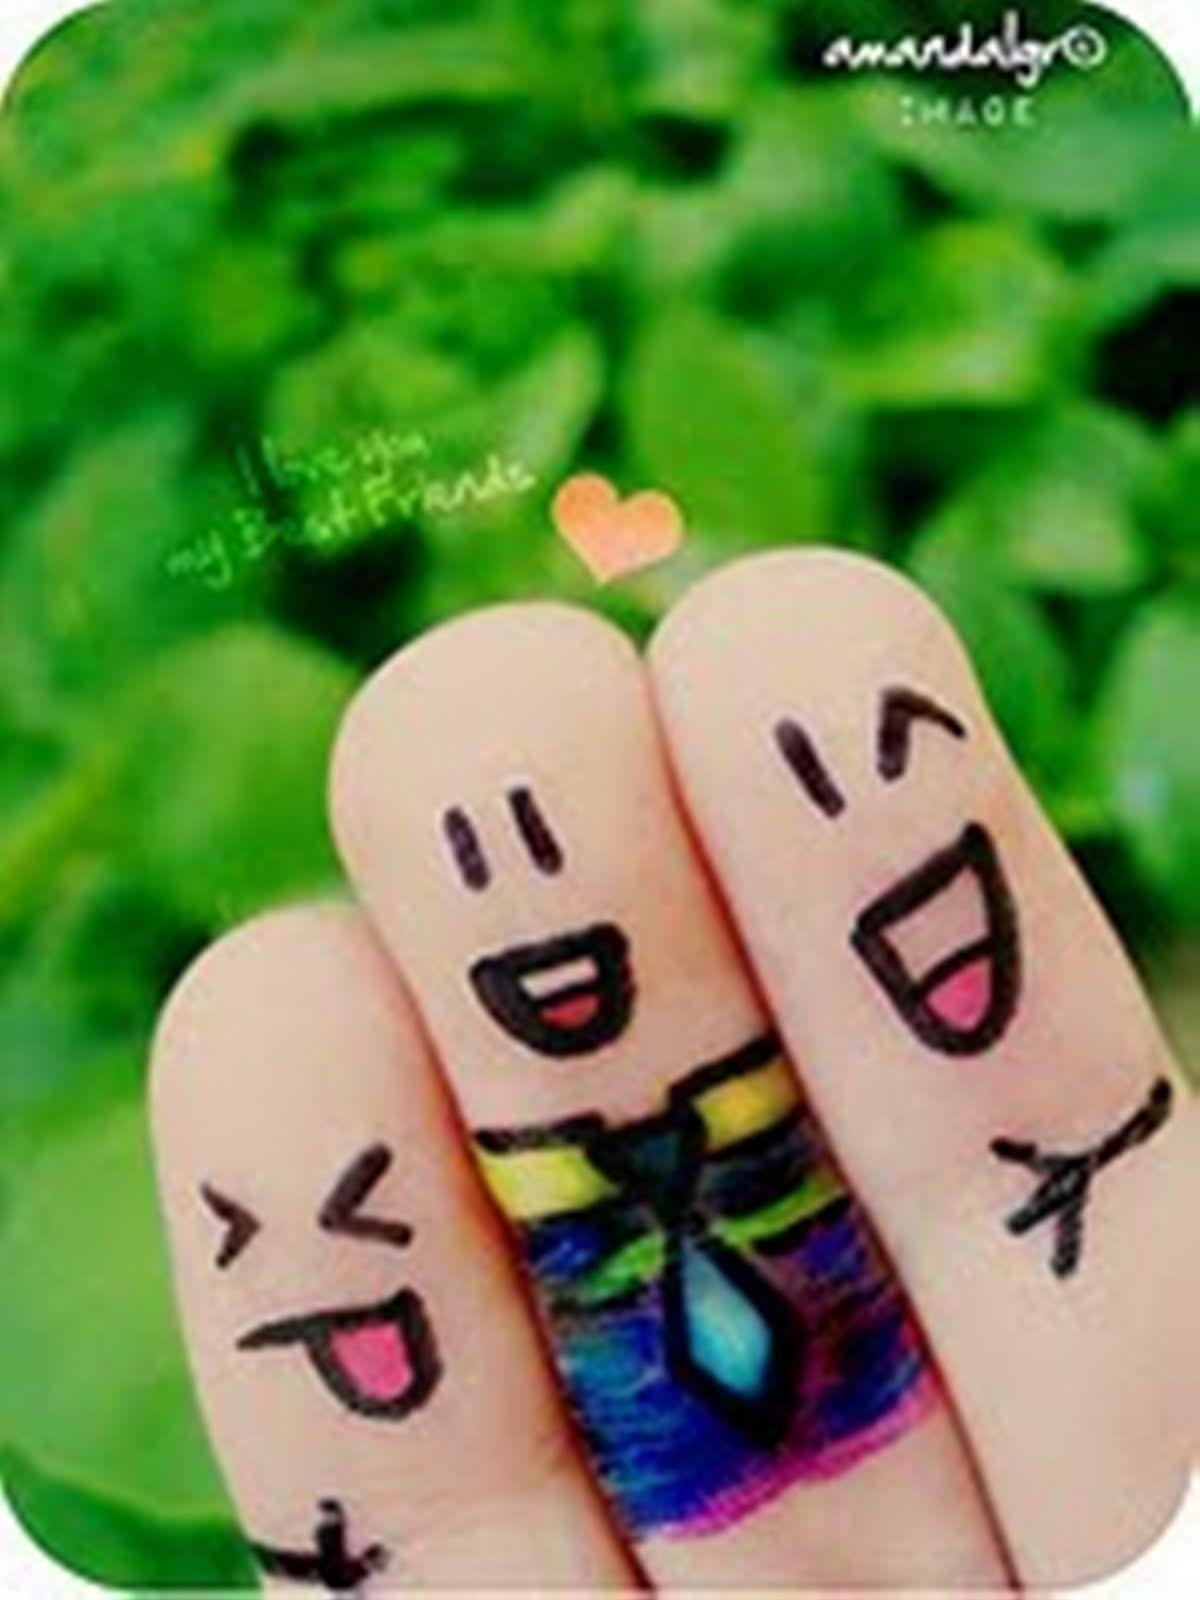 Best Wallpaper Friendship Finger - a589a18c2c75e0065be39a59996b0c42  You Should Have_25917 .jpg